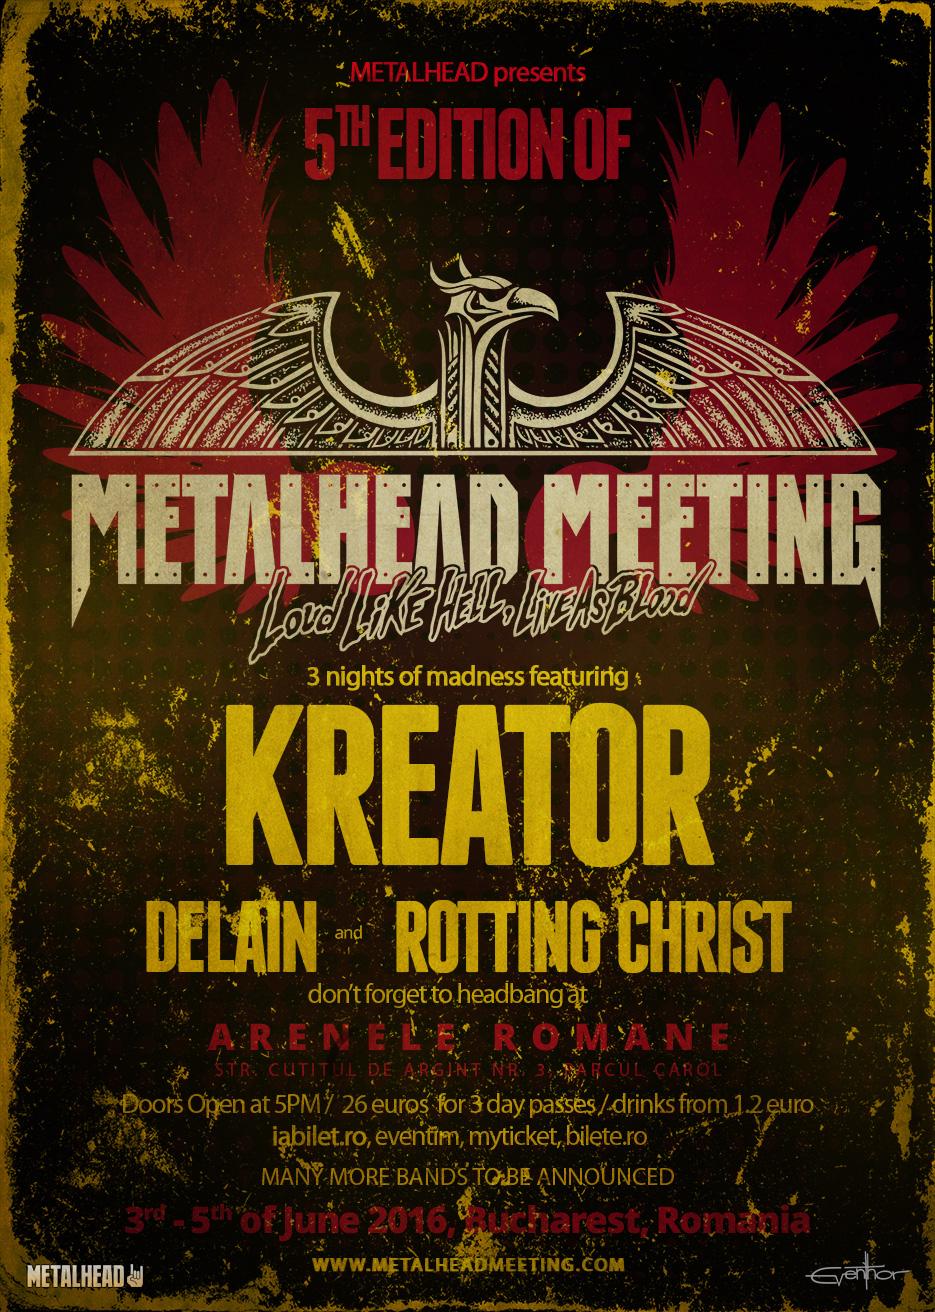 (RO) KREATOR si Delain vor canta la festivalul METALHEAD Meeting 2016